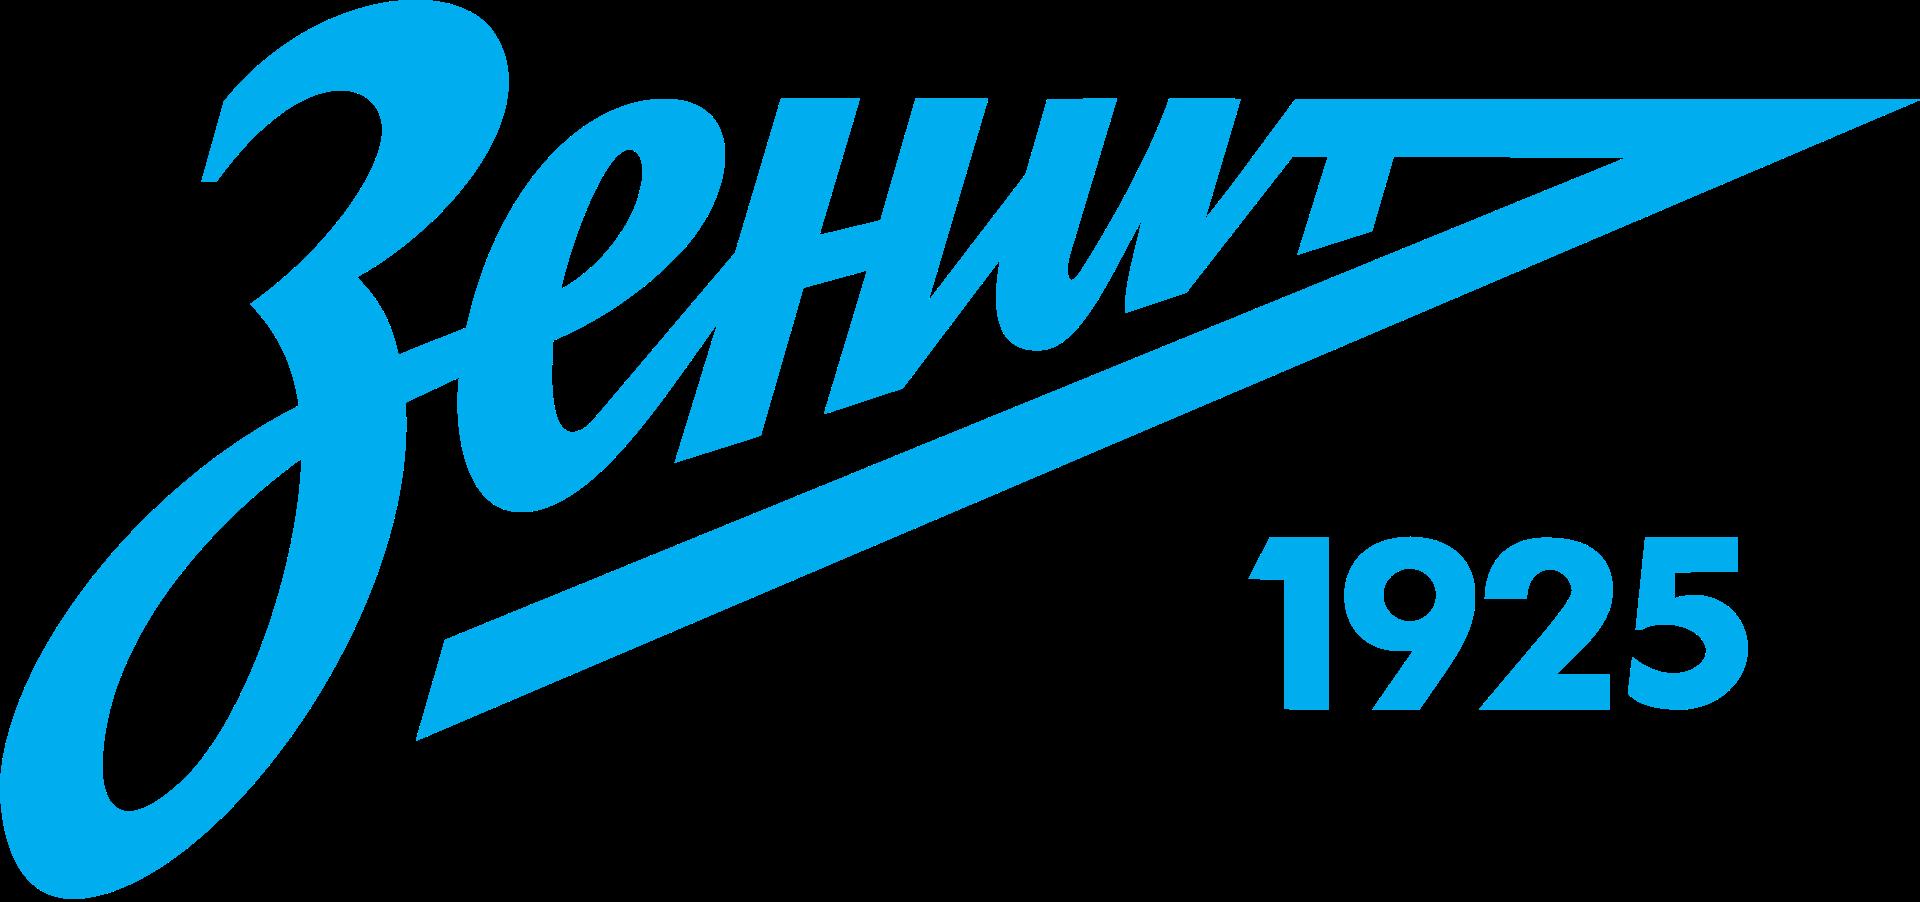 Zenit youth